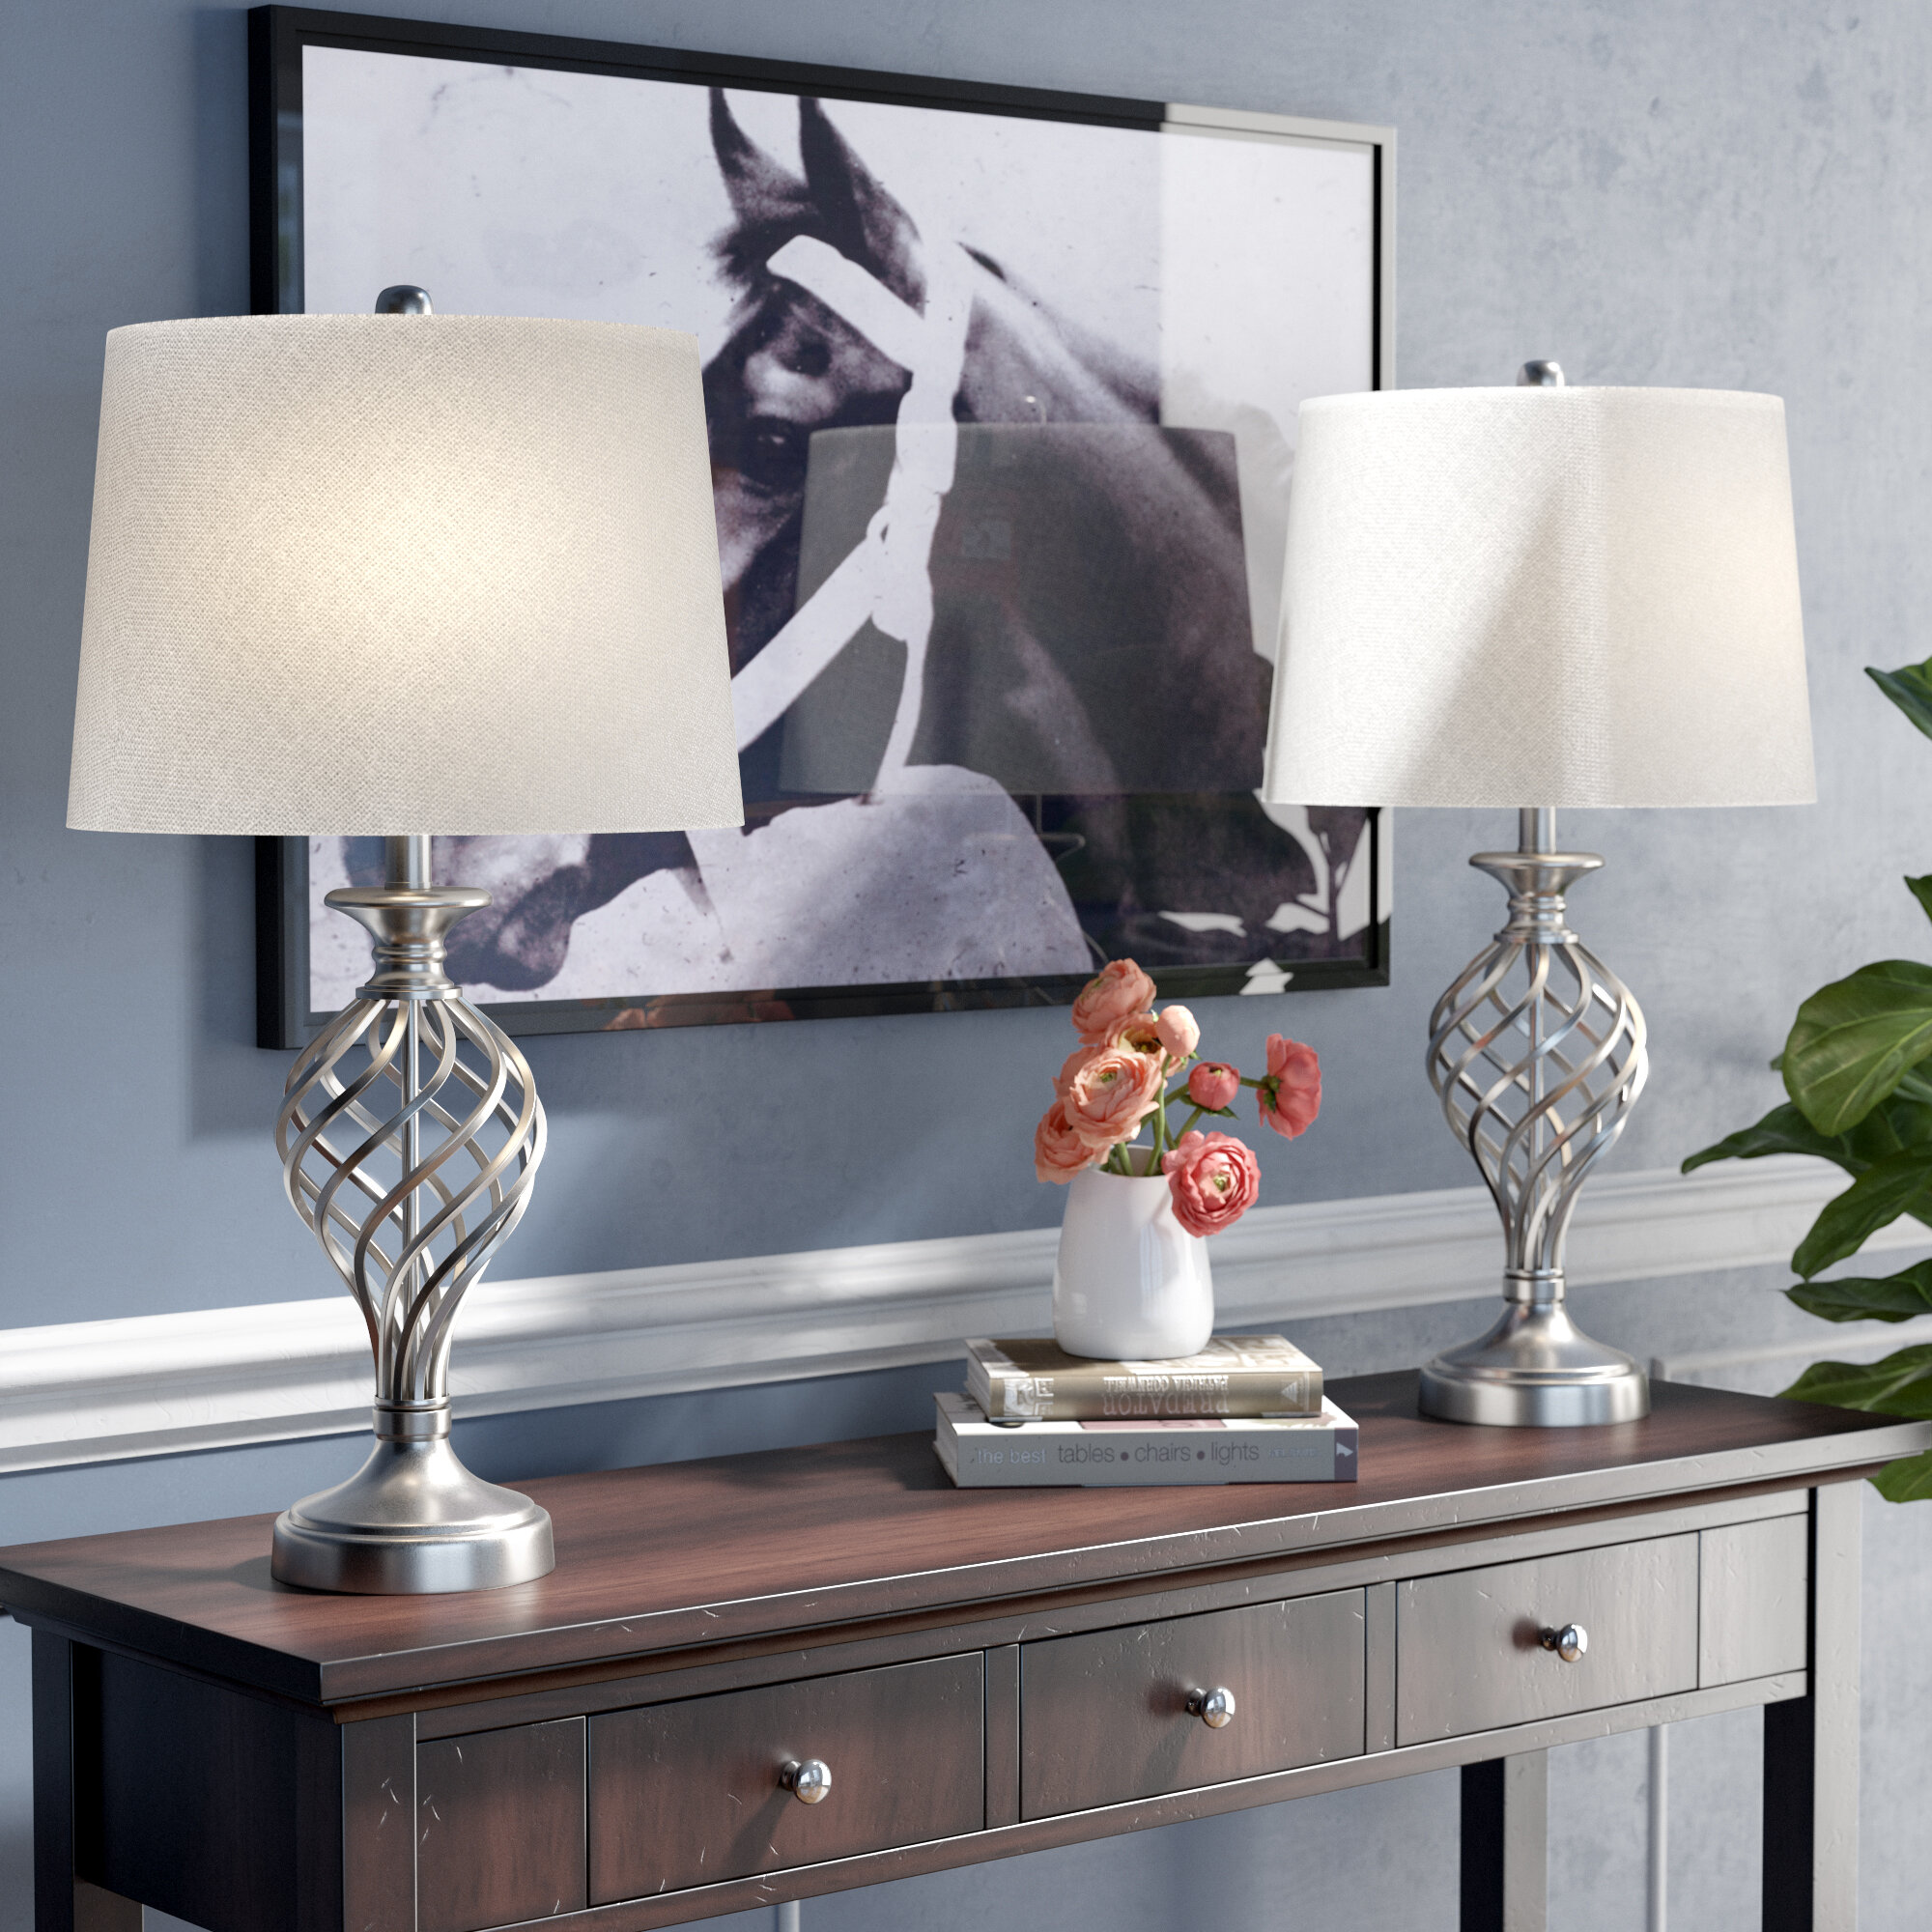 Astoria grand zilla lattice urn 26 75 table lamp reviews wayfair